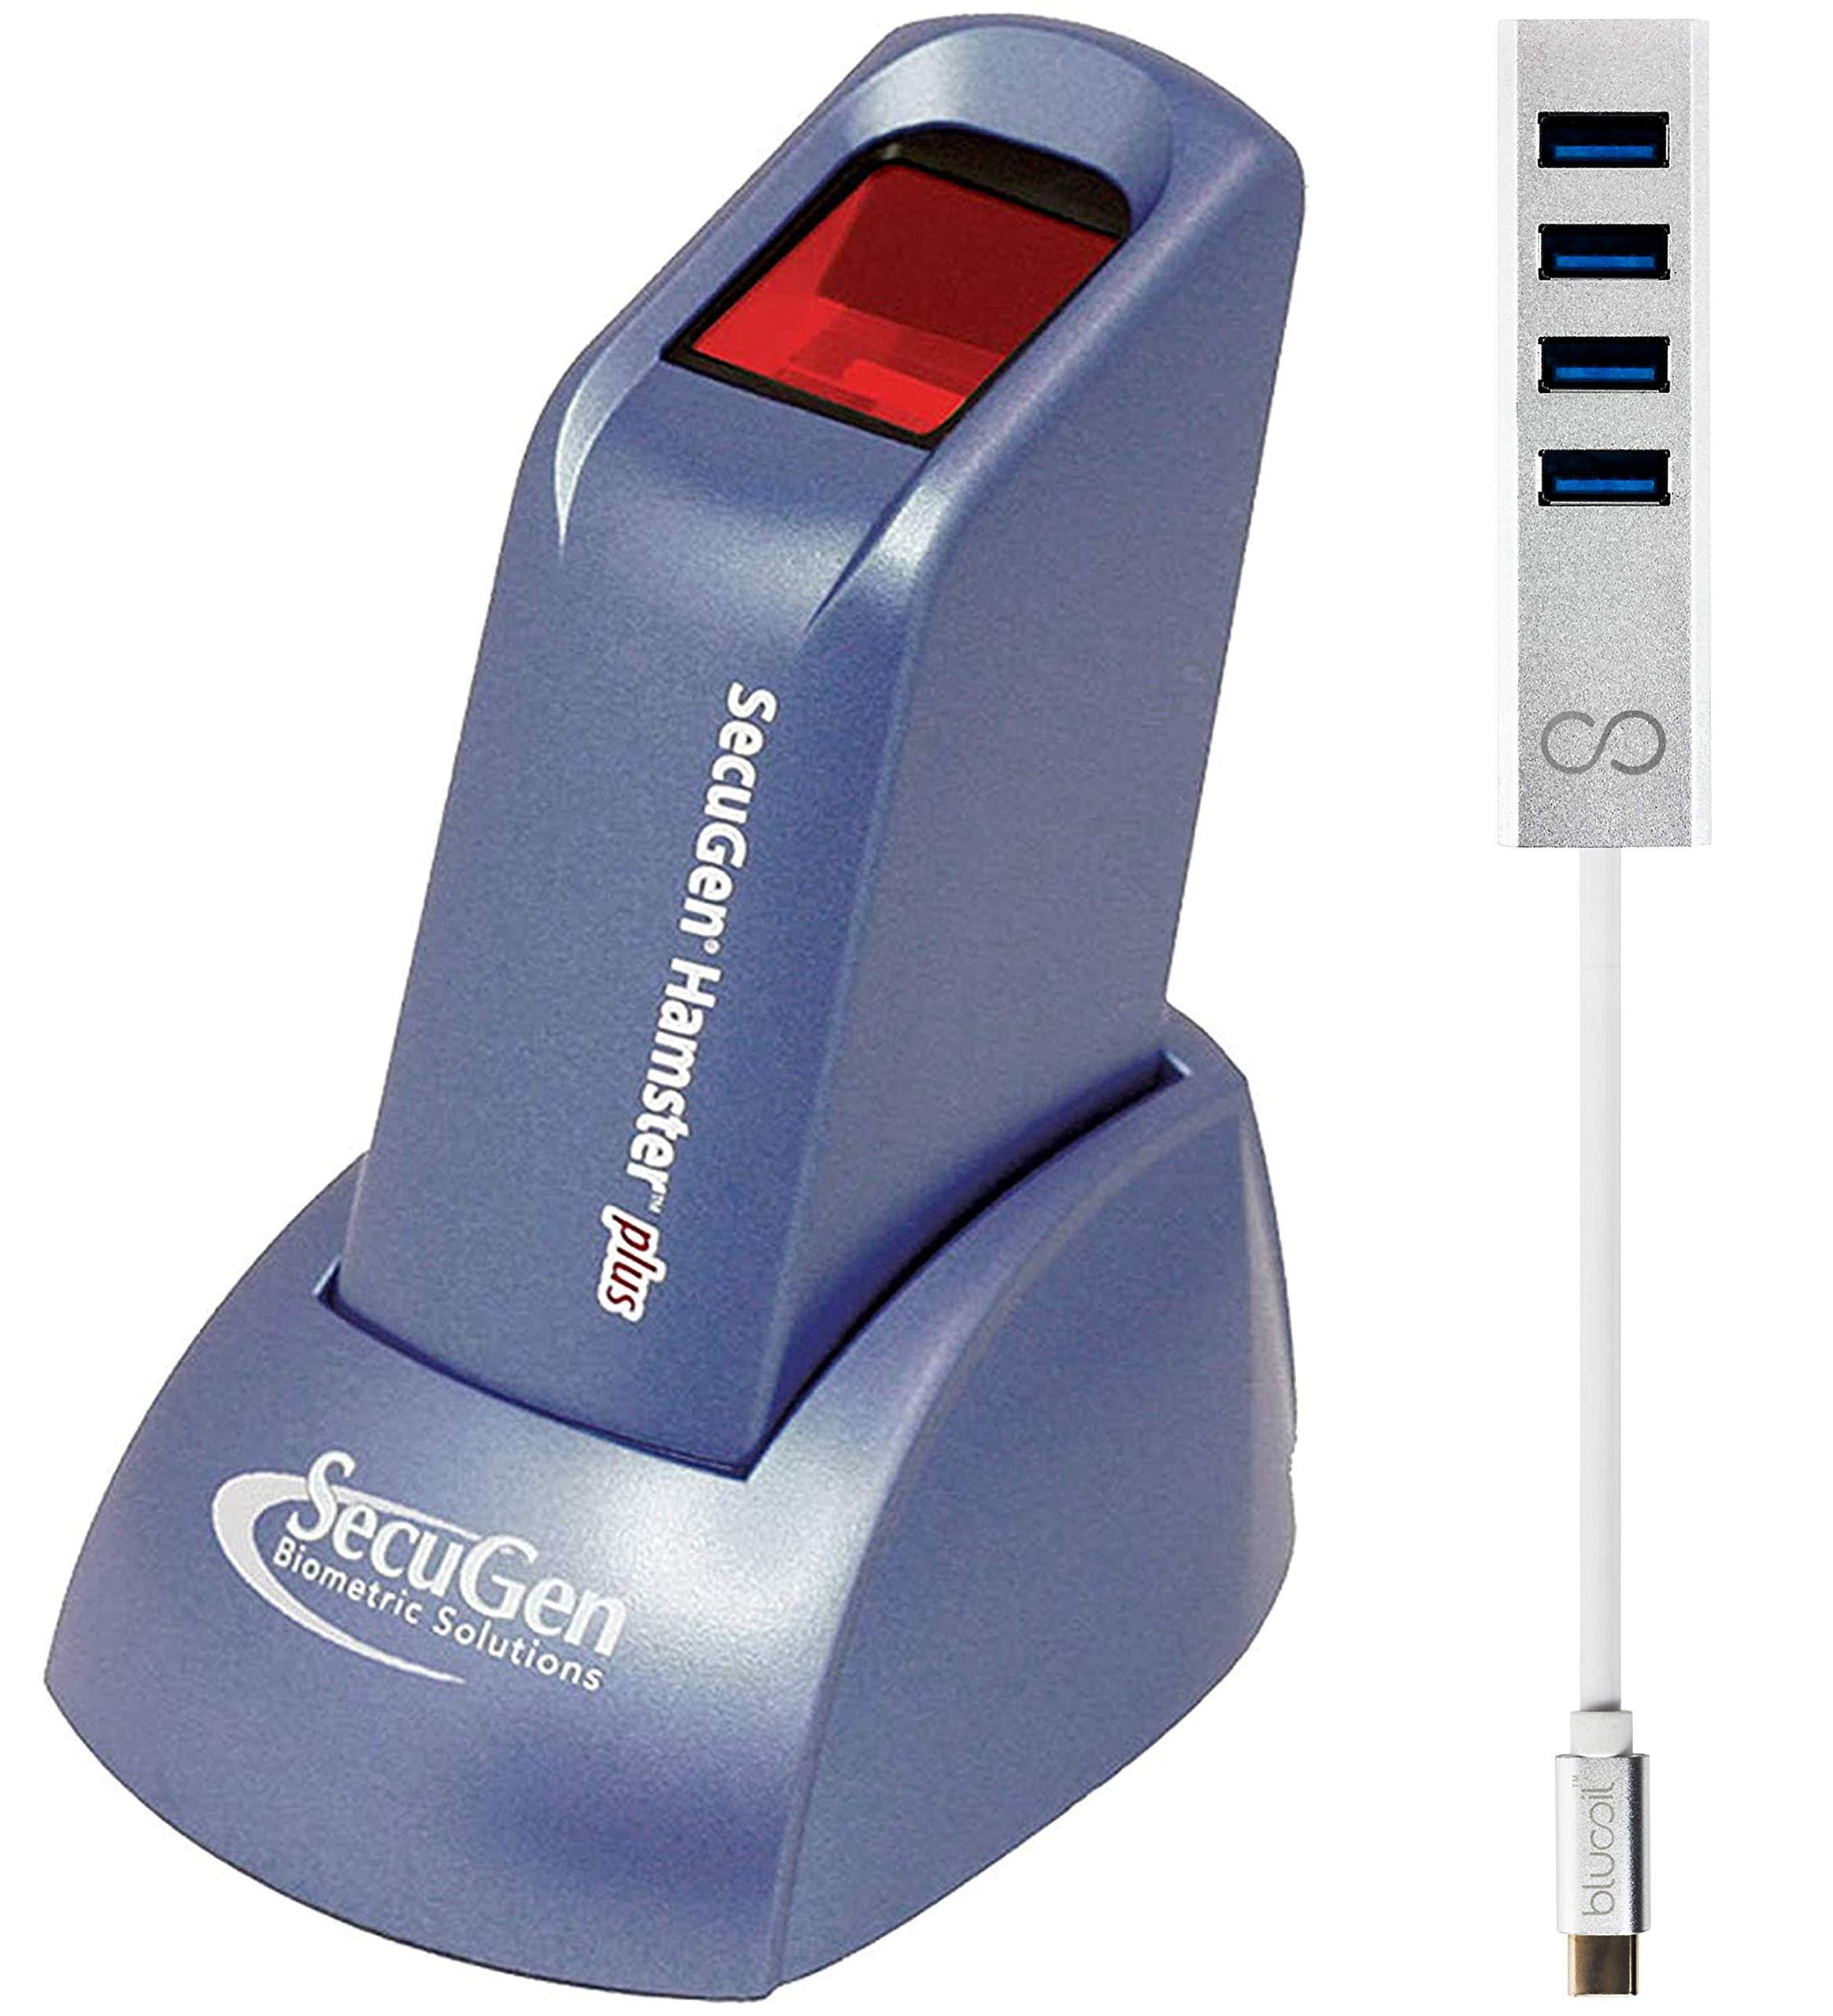 SecuGen Hamster Plus Fingerprint Scanner - Biometric Sensor Bundle with Blucoil USB Type-C Mini Hub with 4 Ports